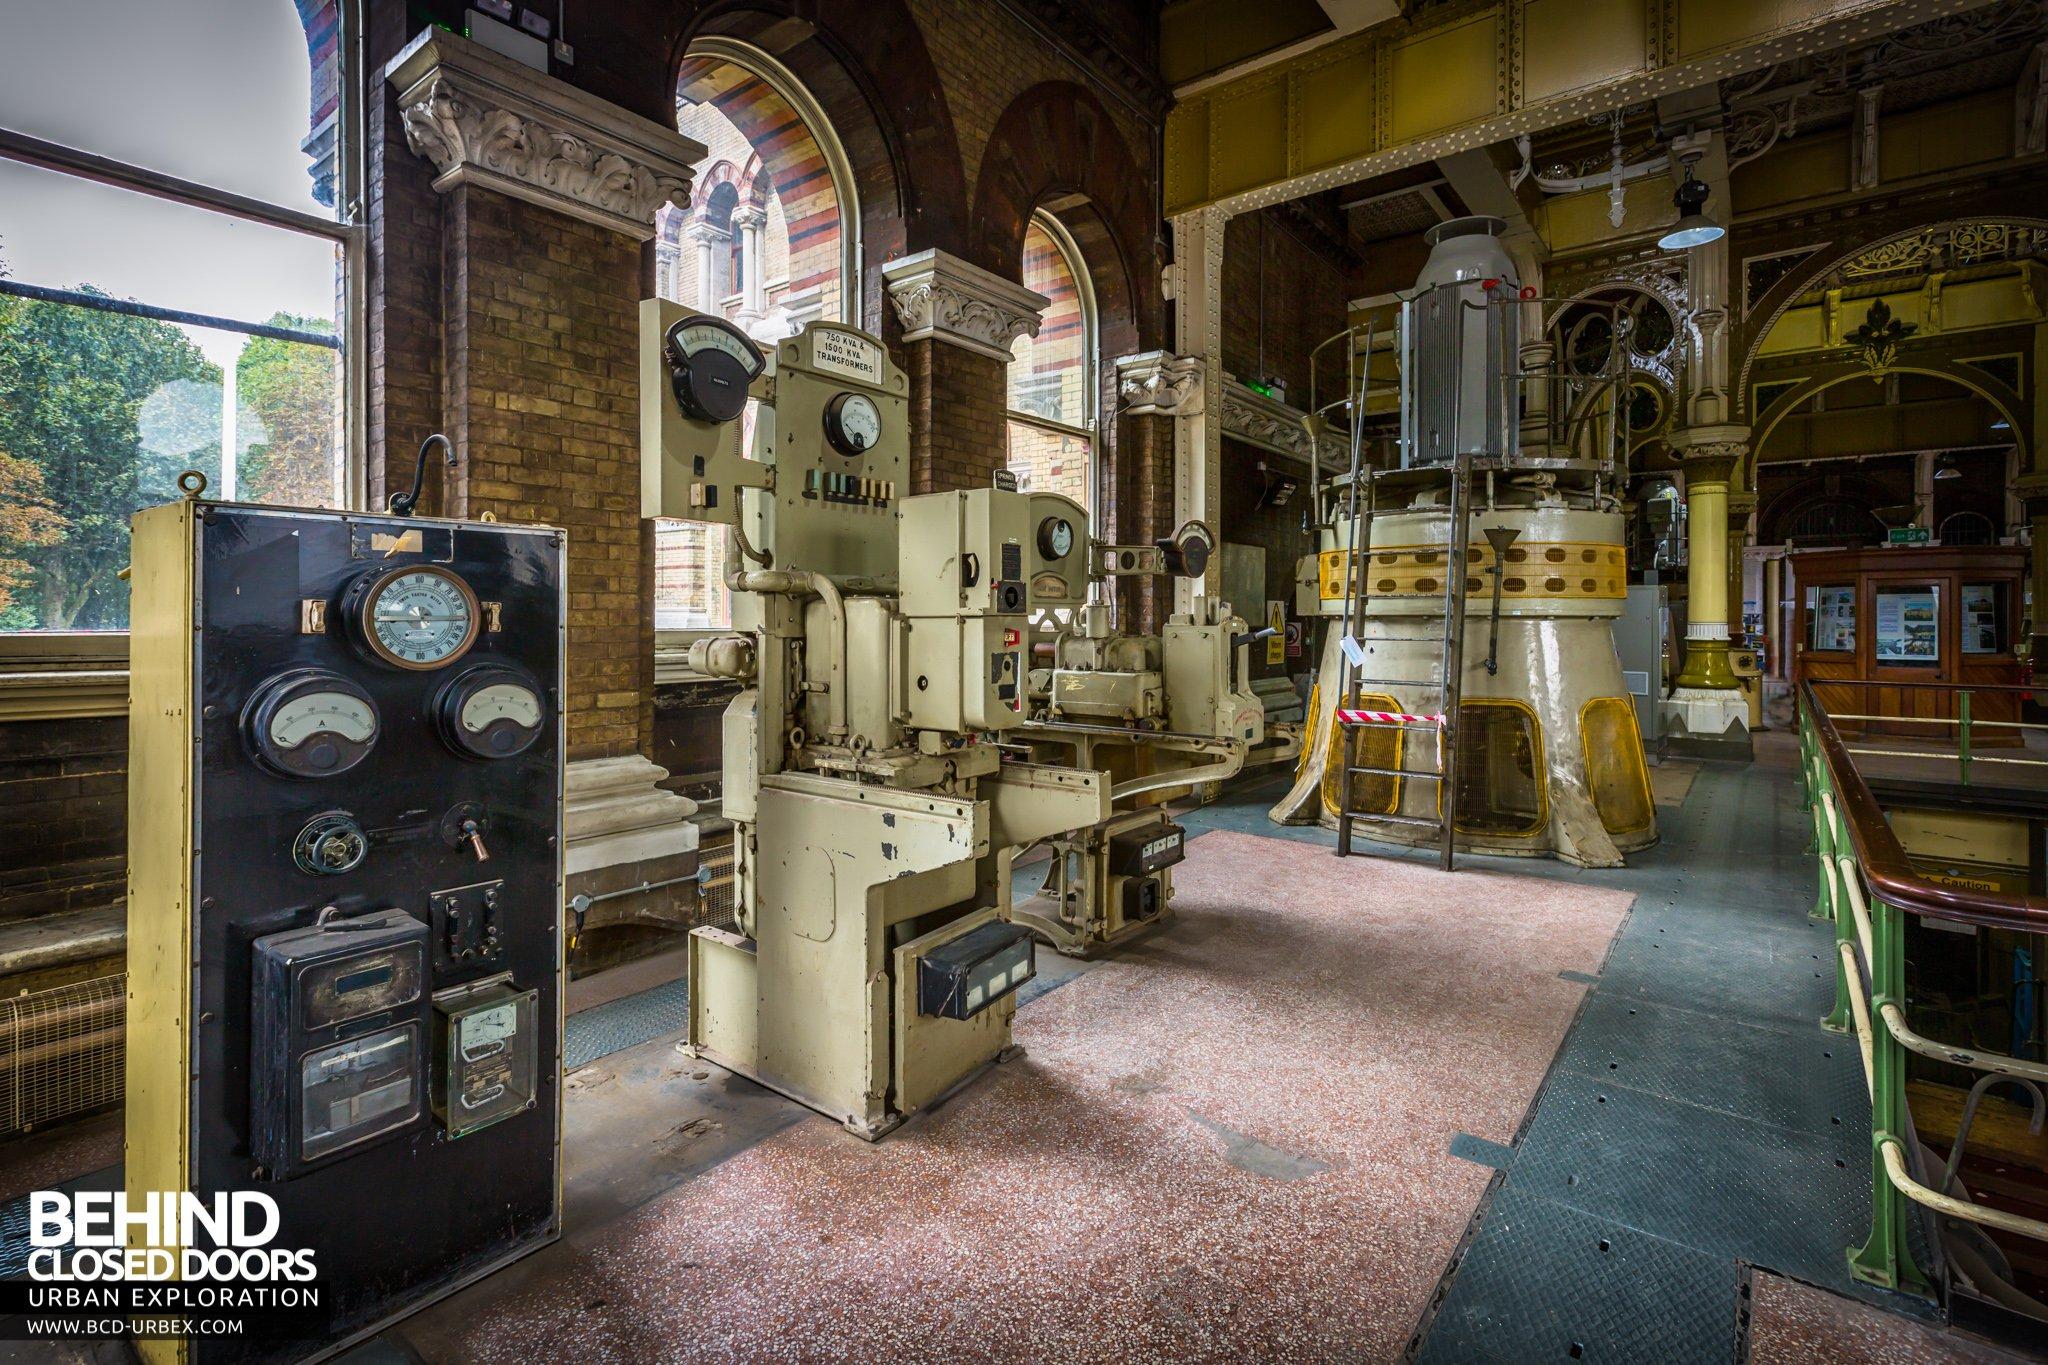 Abbey Mills Pumping Station London Uk 187 Urbex Behind